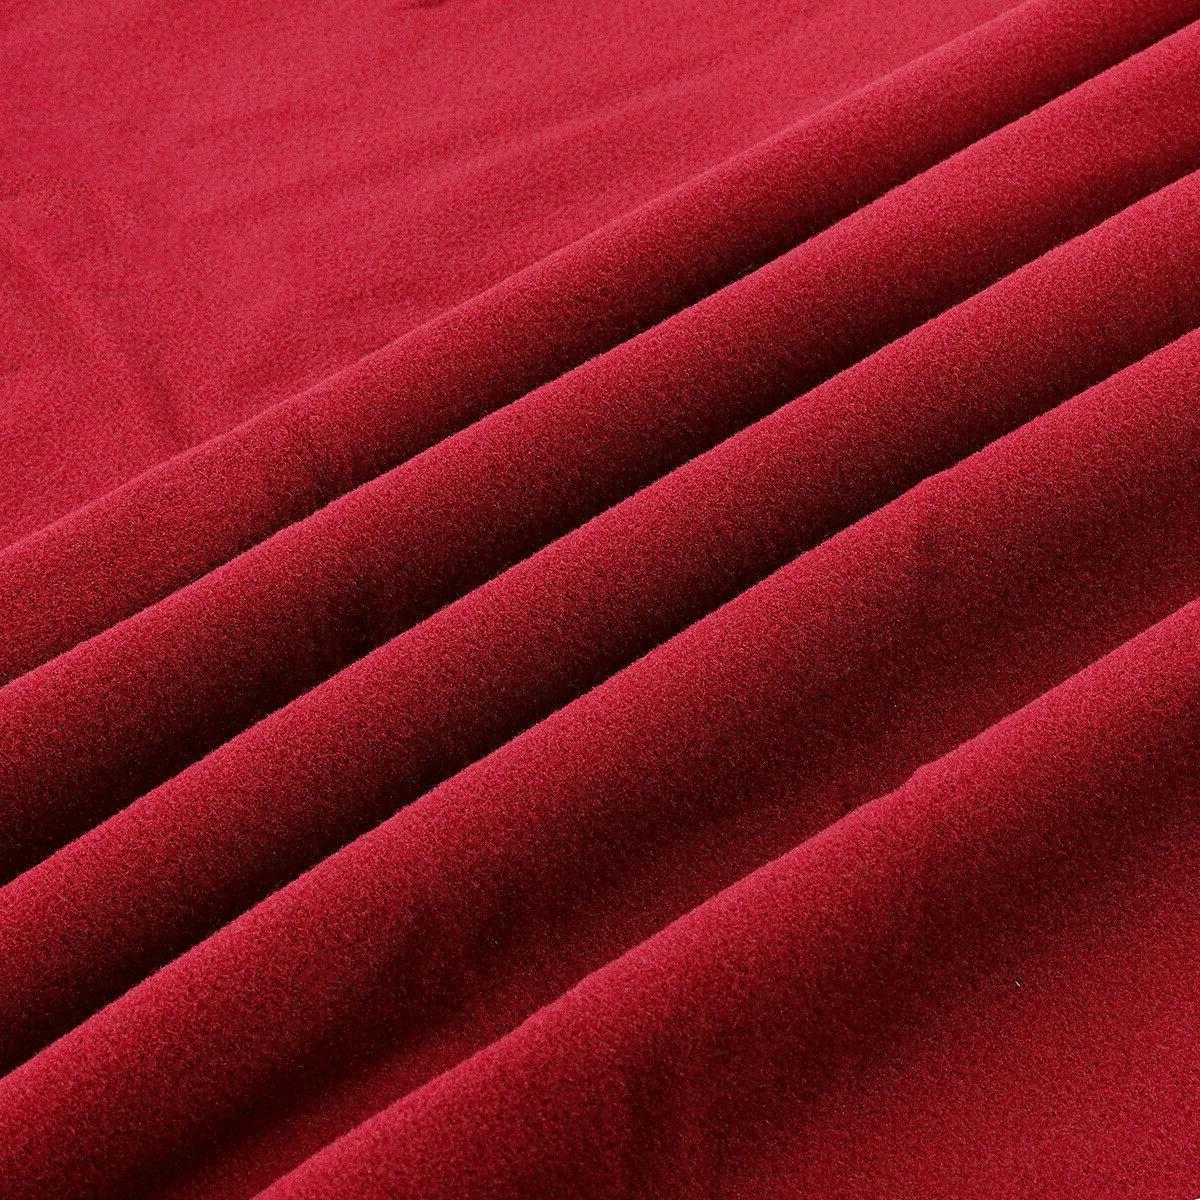 Professional Billiard Pool Cloth Mat Cover Indoor